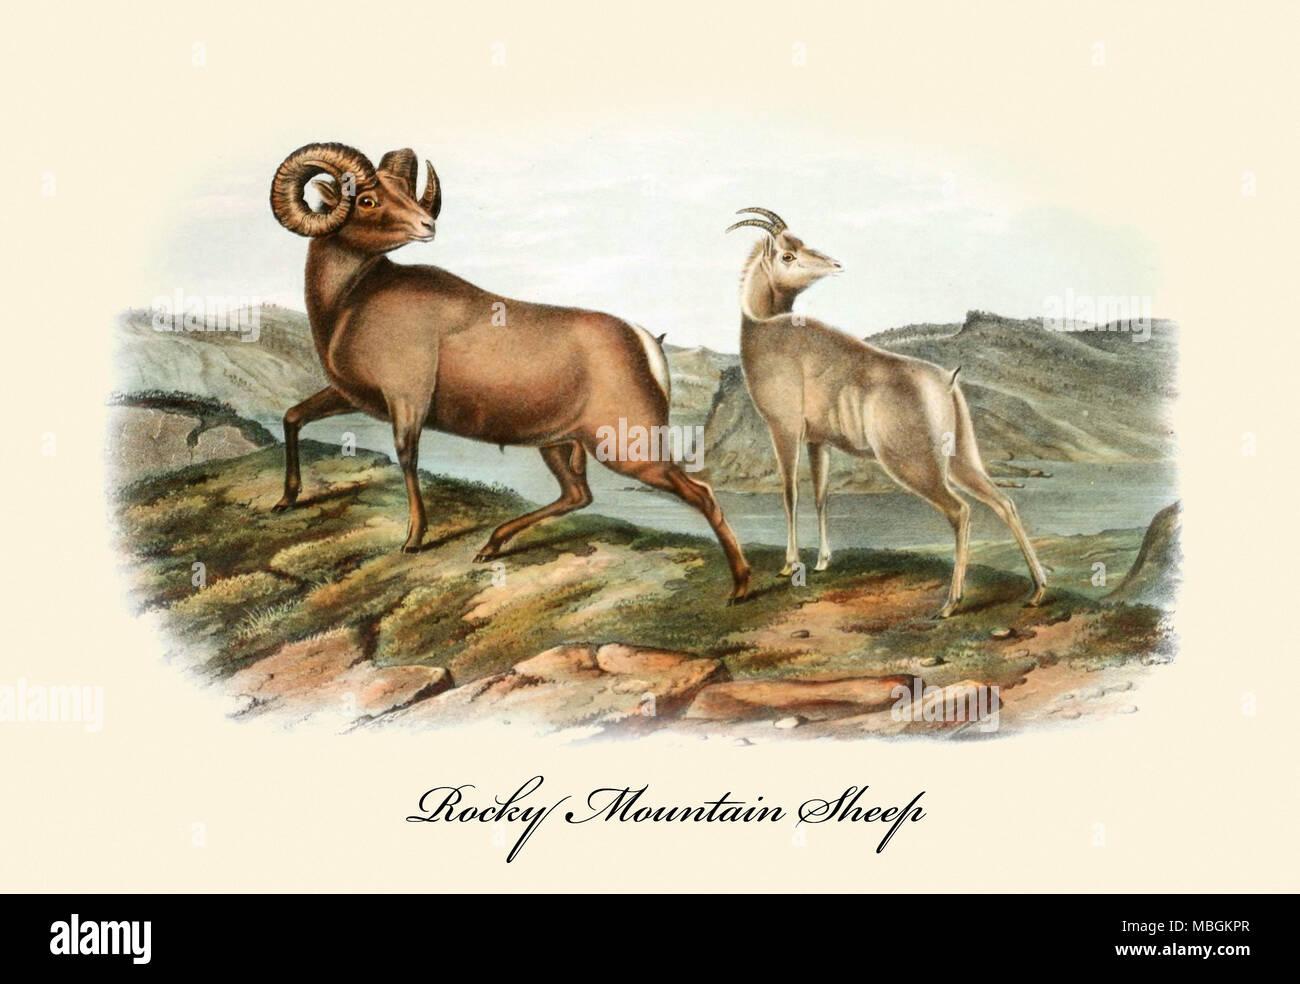 Rocky Mountain Sheep - Stock Image